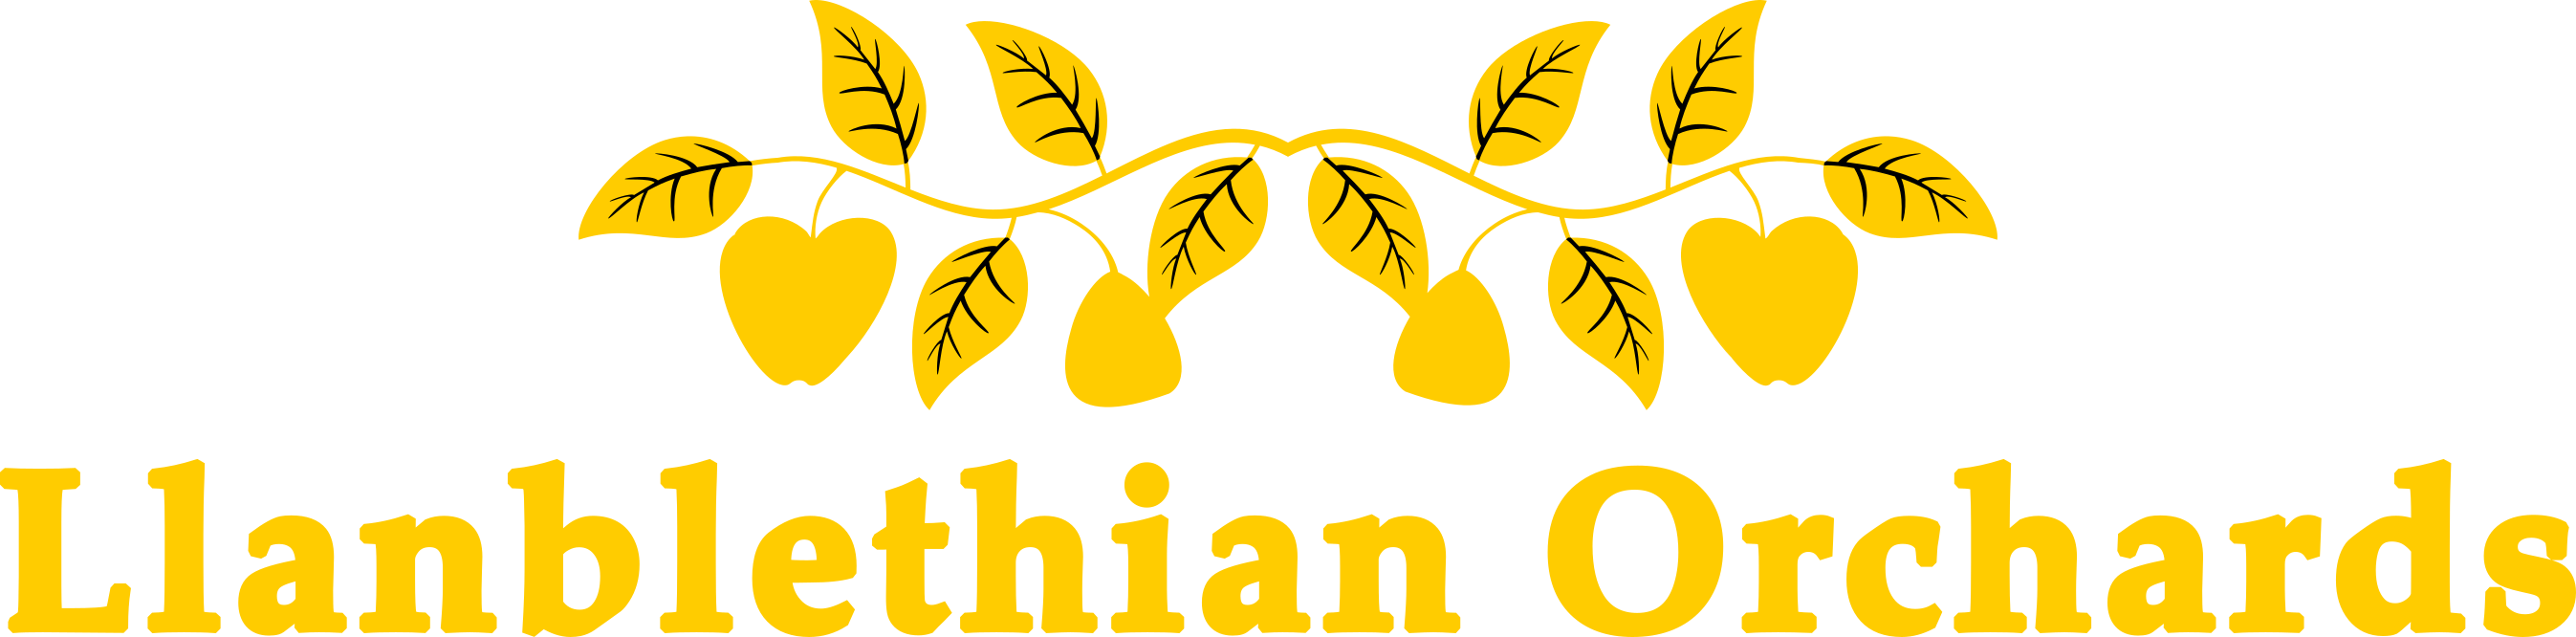 Llanblethian Orchards